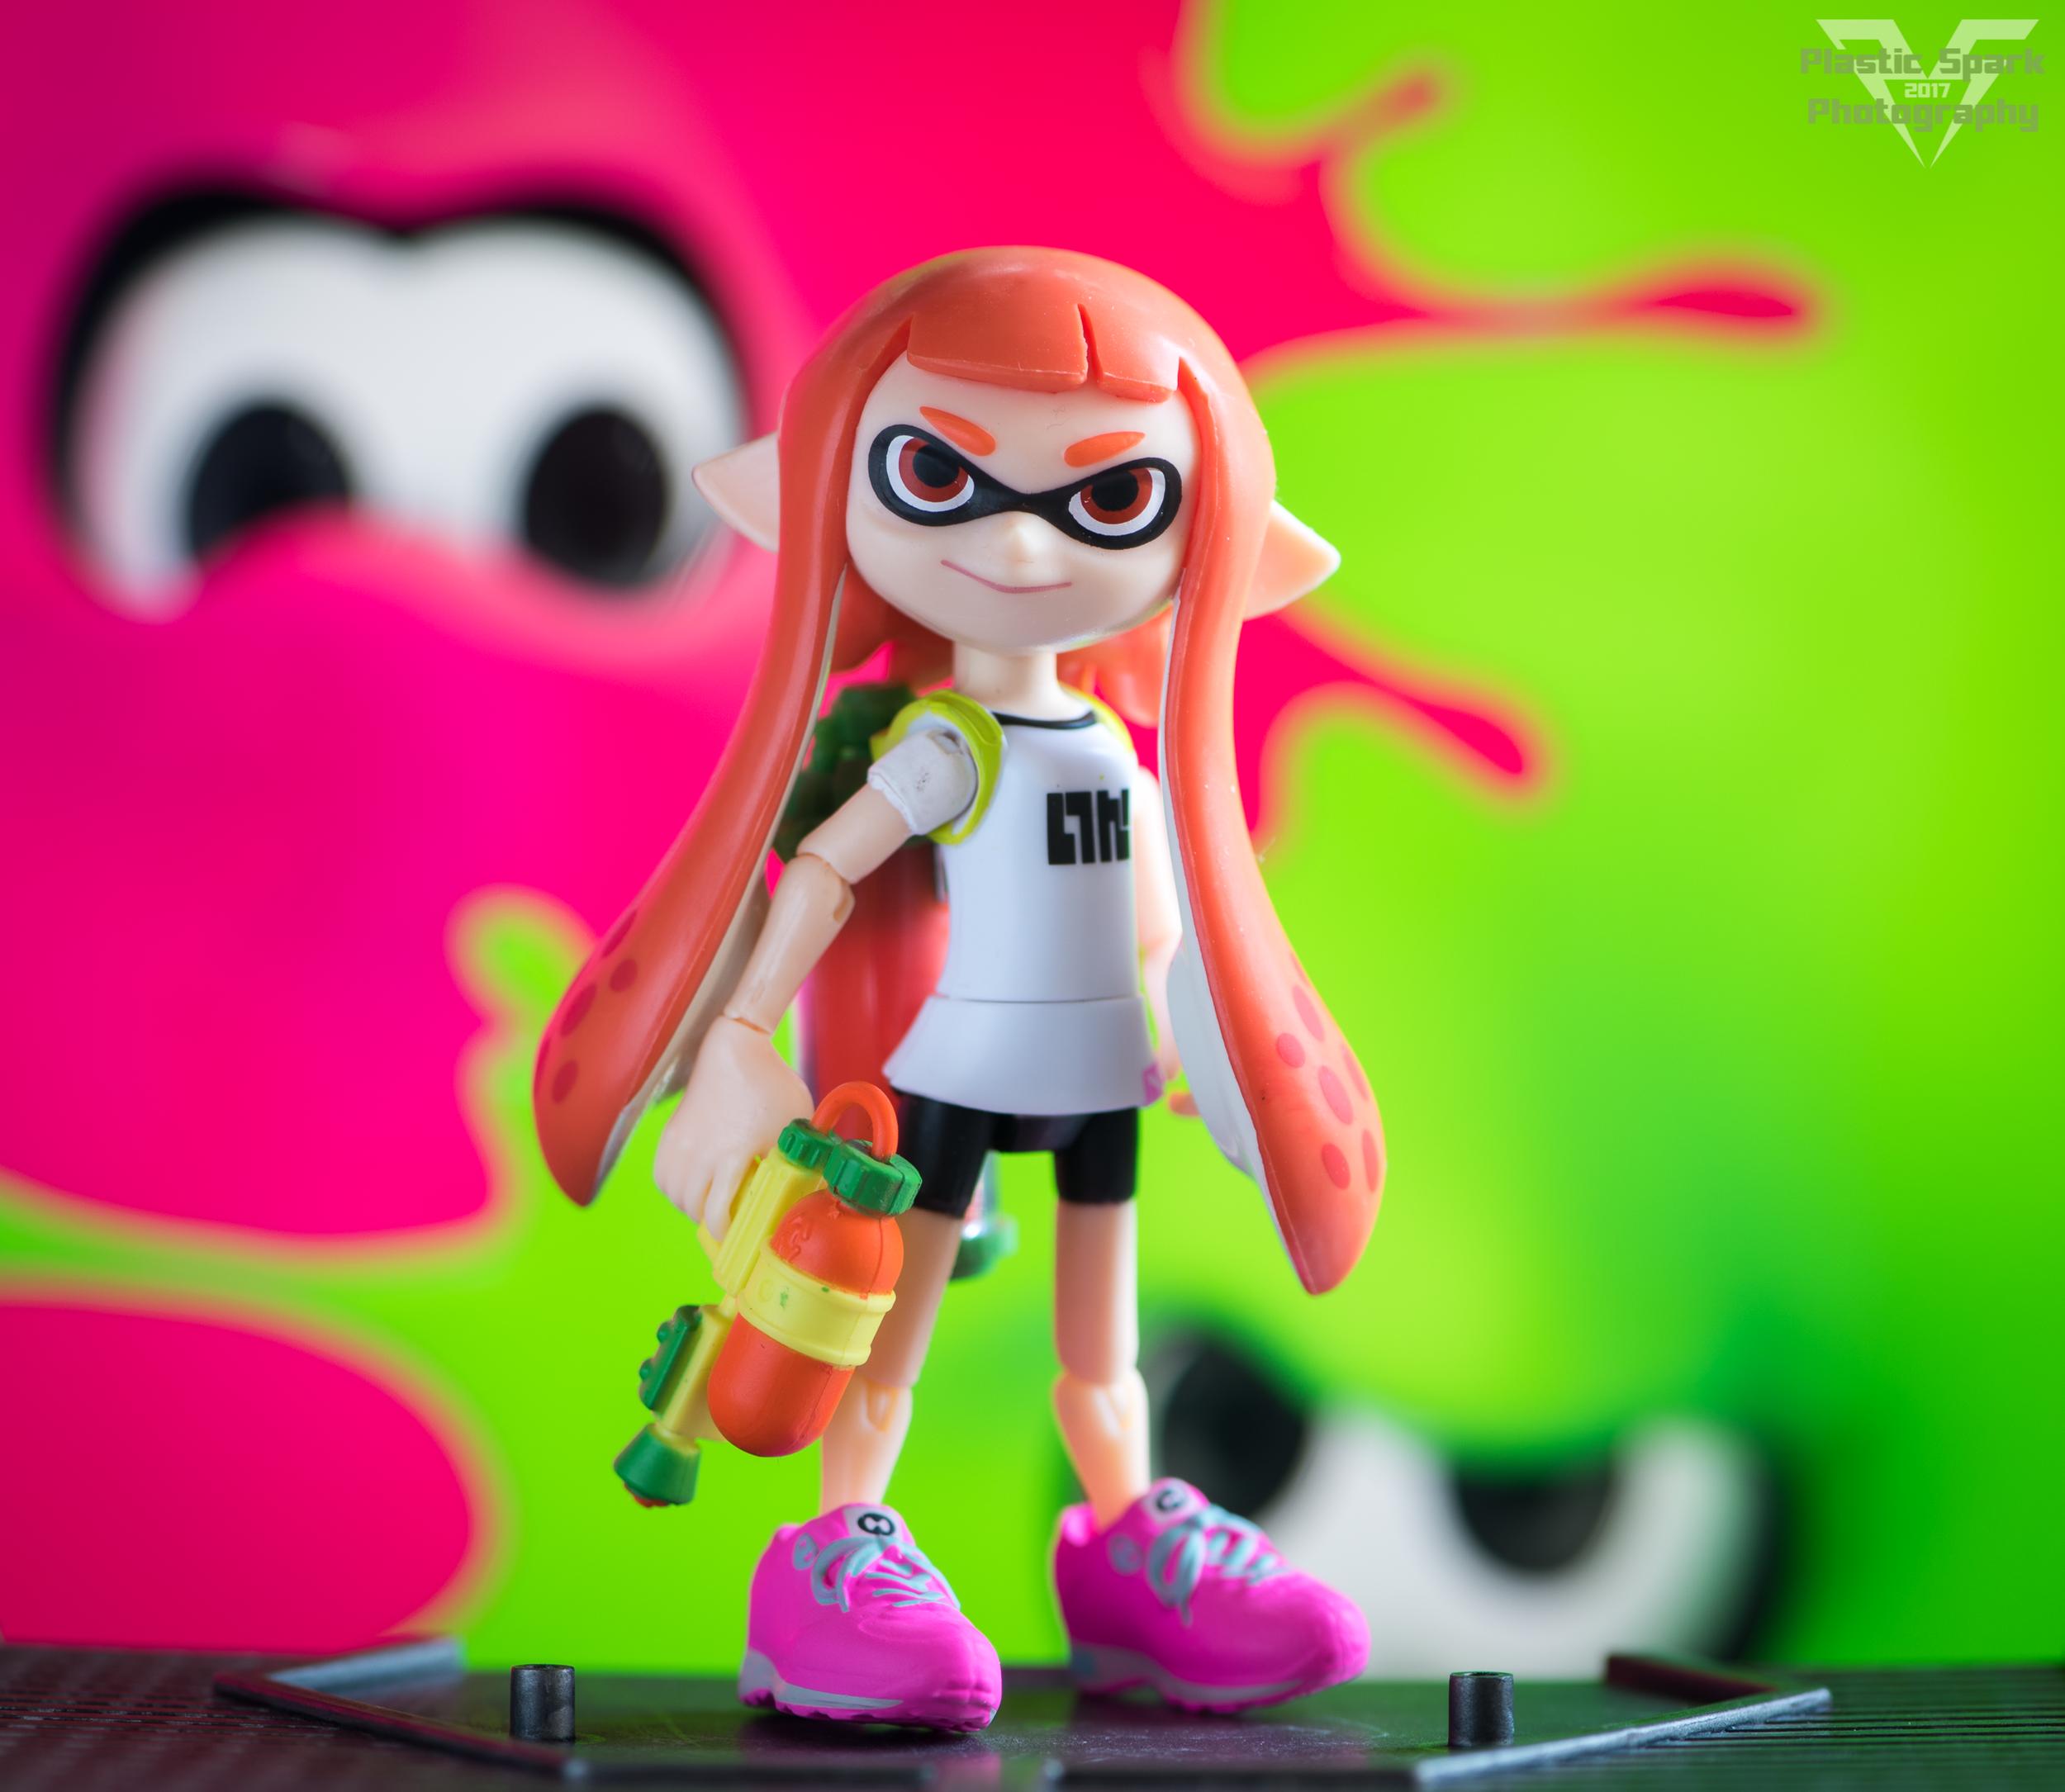 World-of-Nintendo-Inkling-Girl-(3-of-8).png